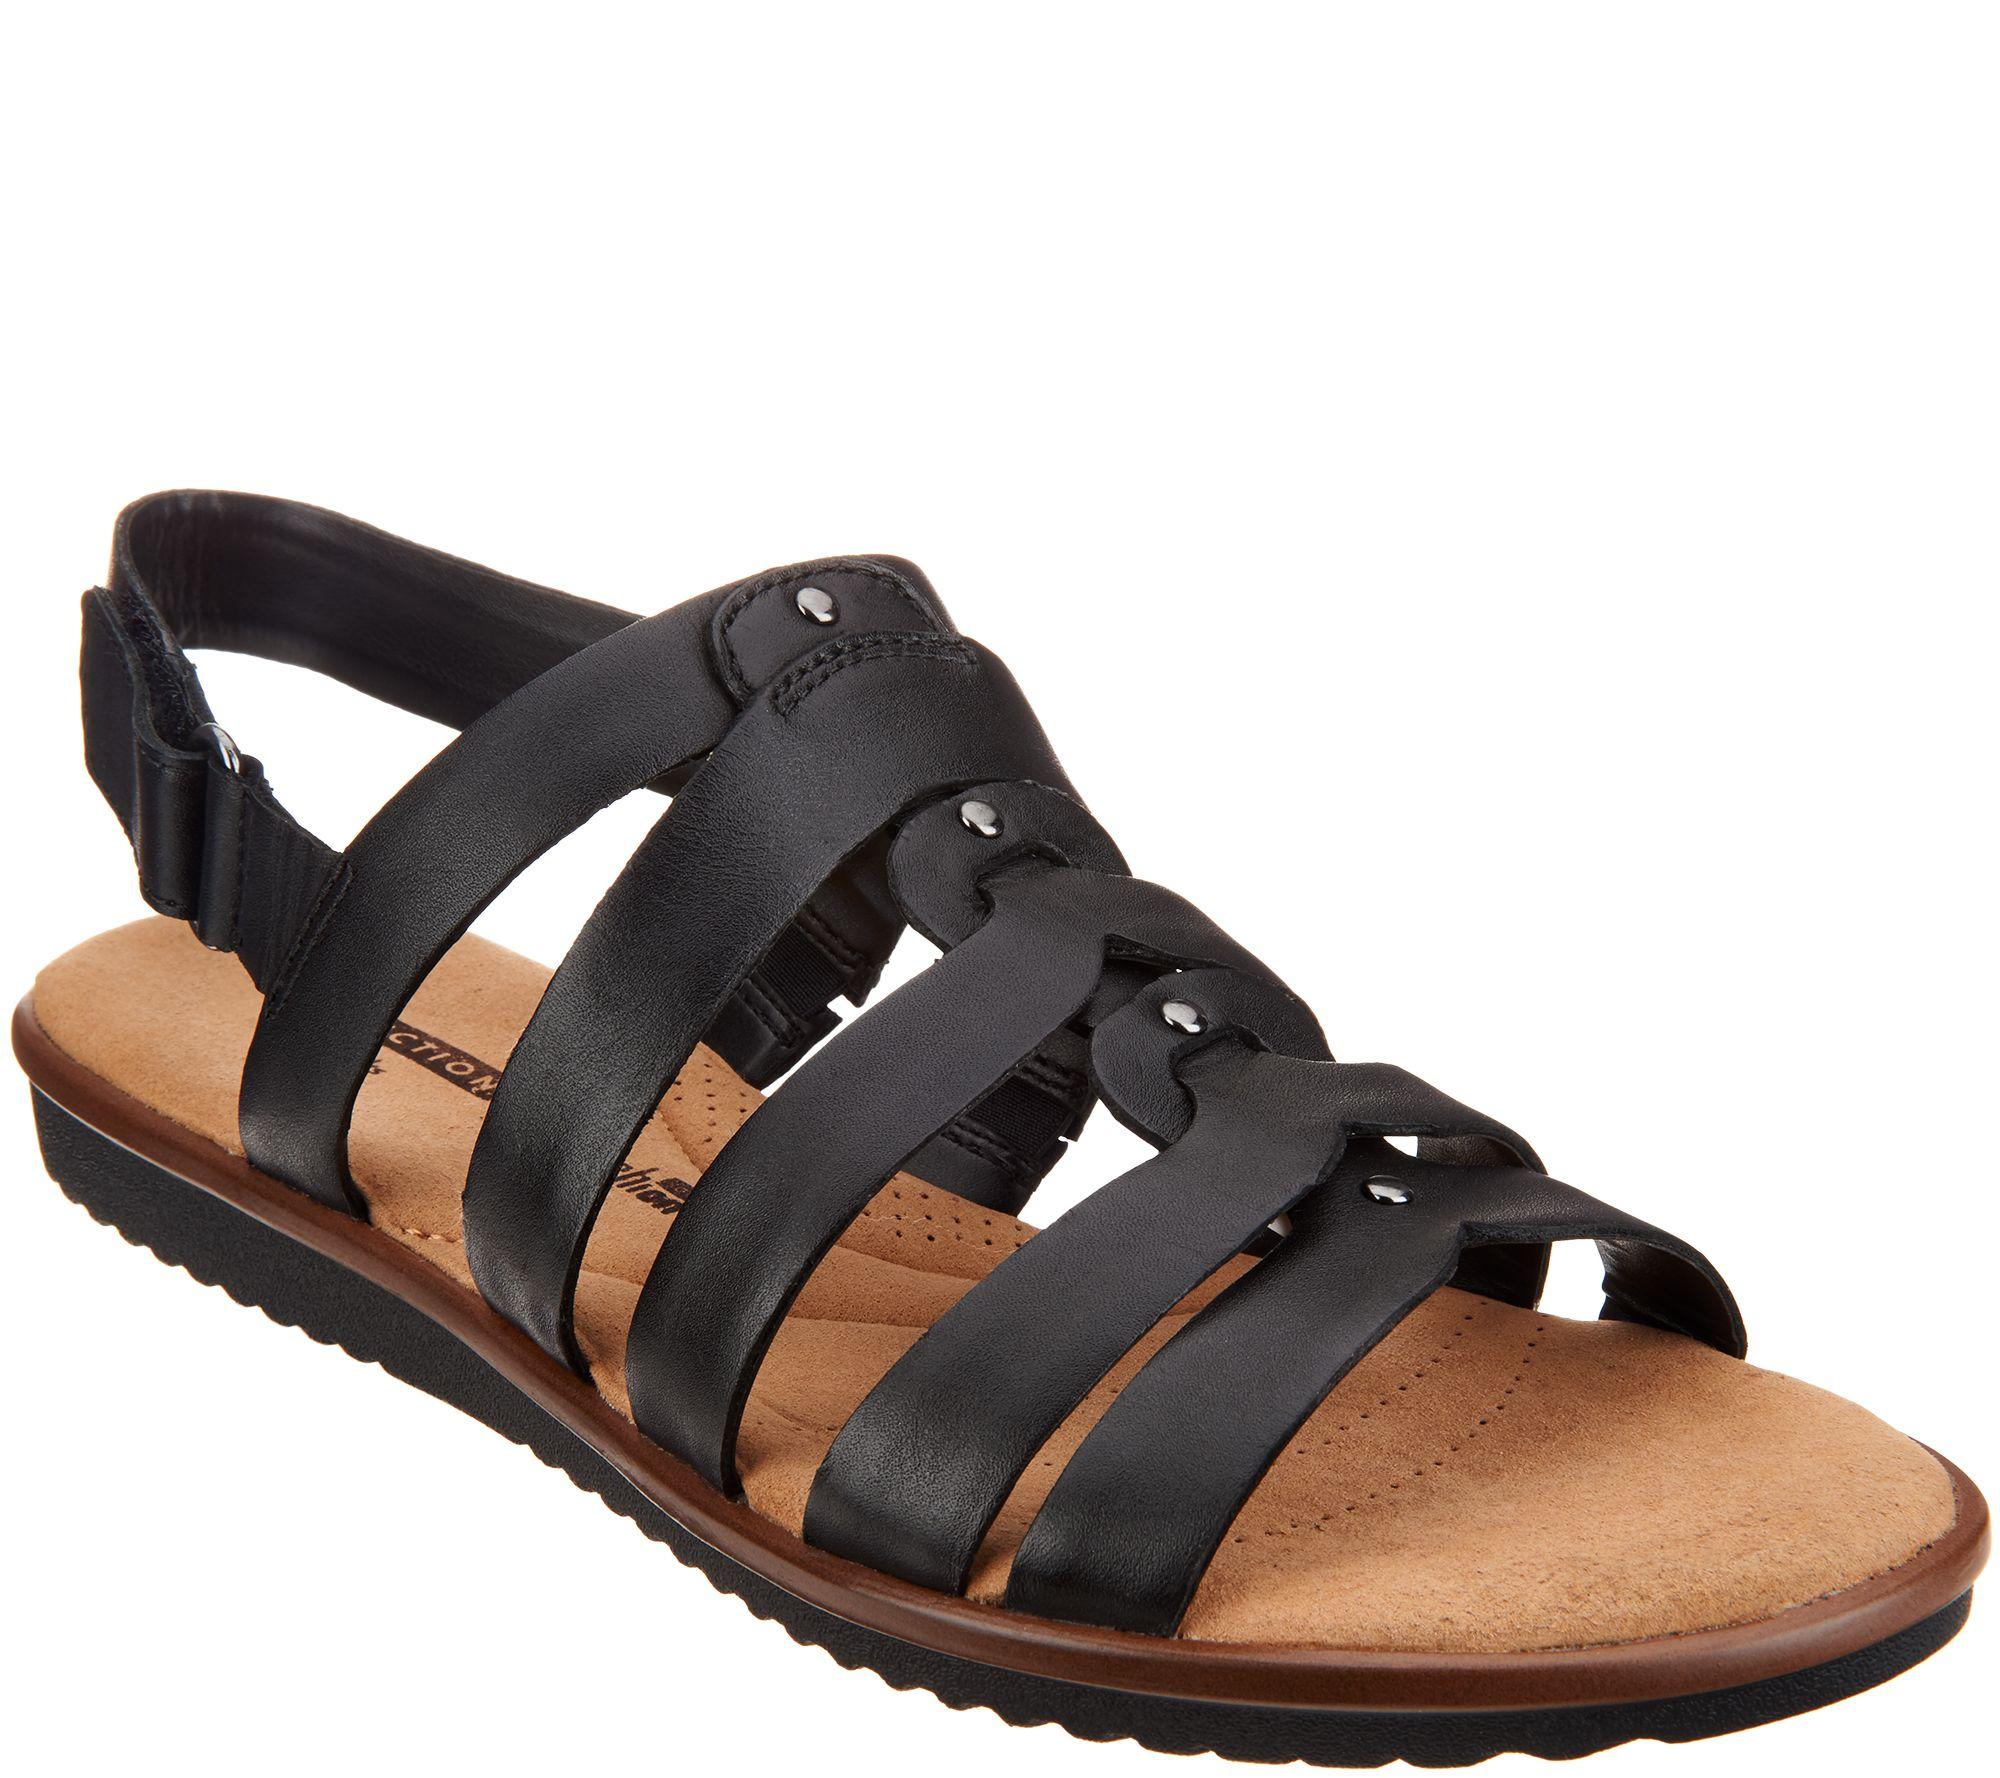 85fd9551a68f Clarks Leather Stud Detail Sandals - Kele Jasmine - Page 1 — QVC.com